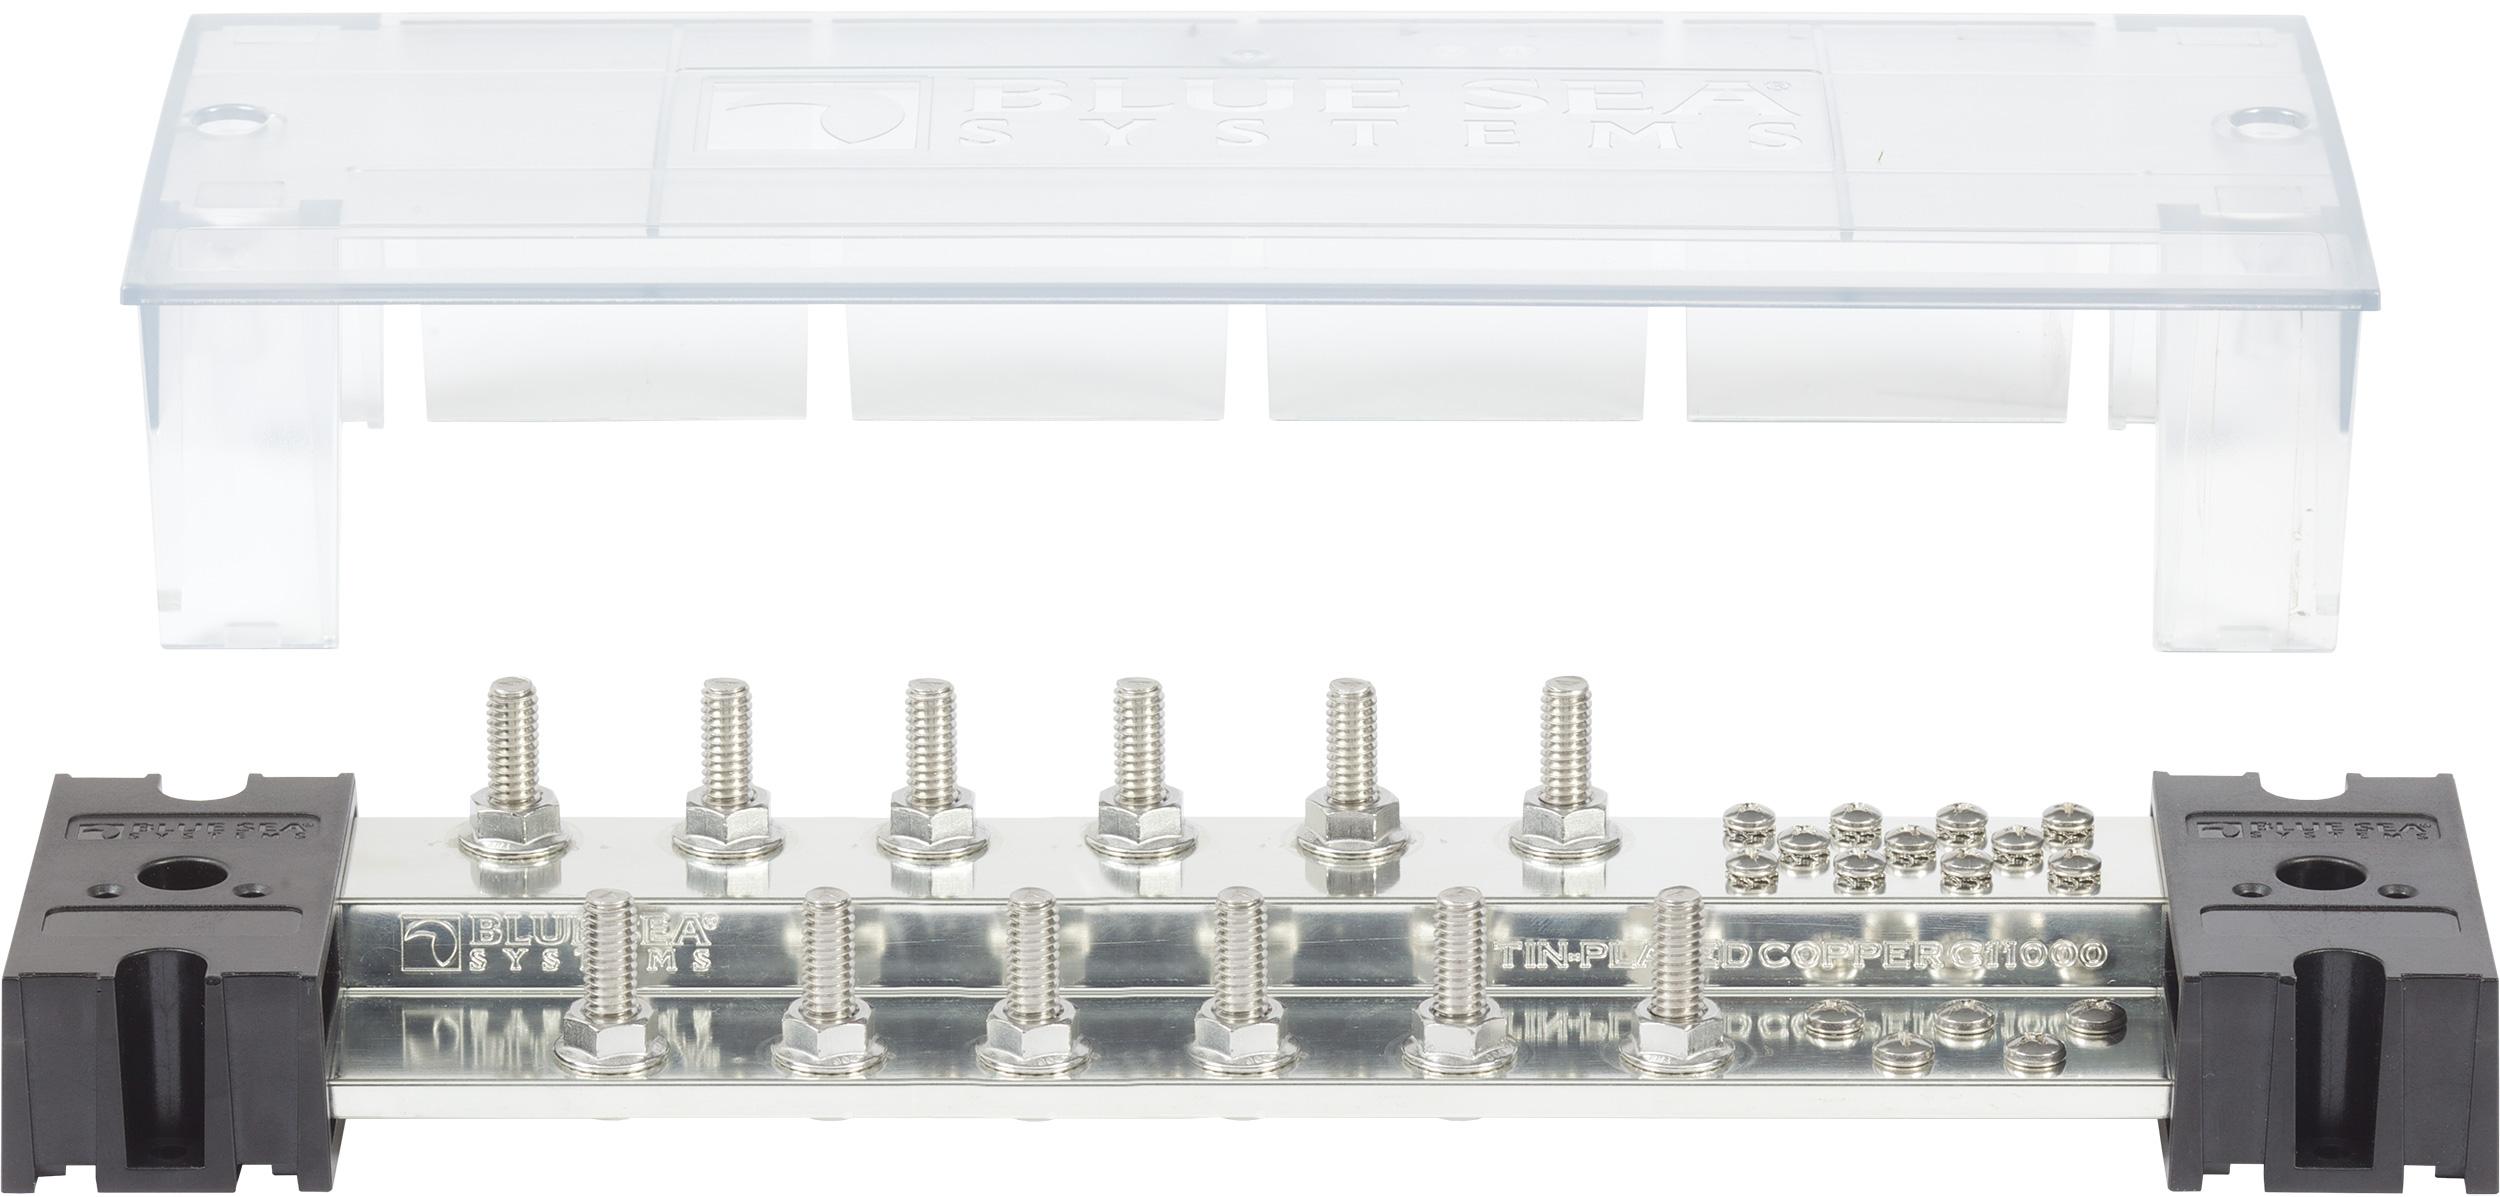 Powerbar 1000 - 12 5  16 U0026quot  Terminal Studs